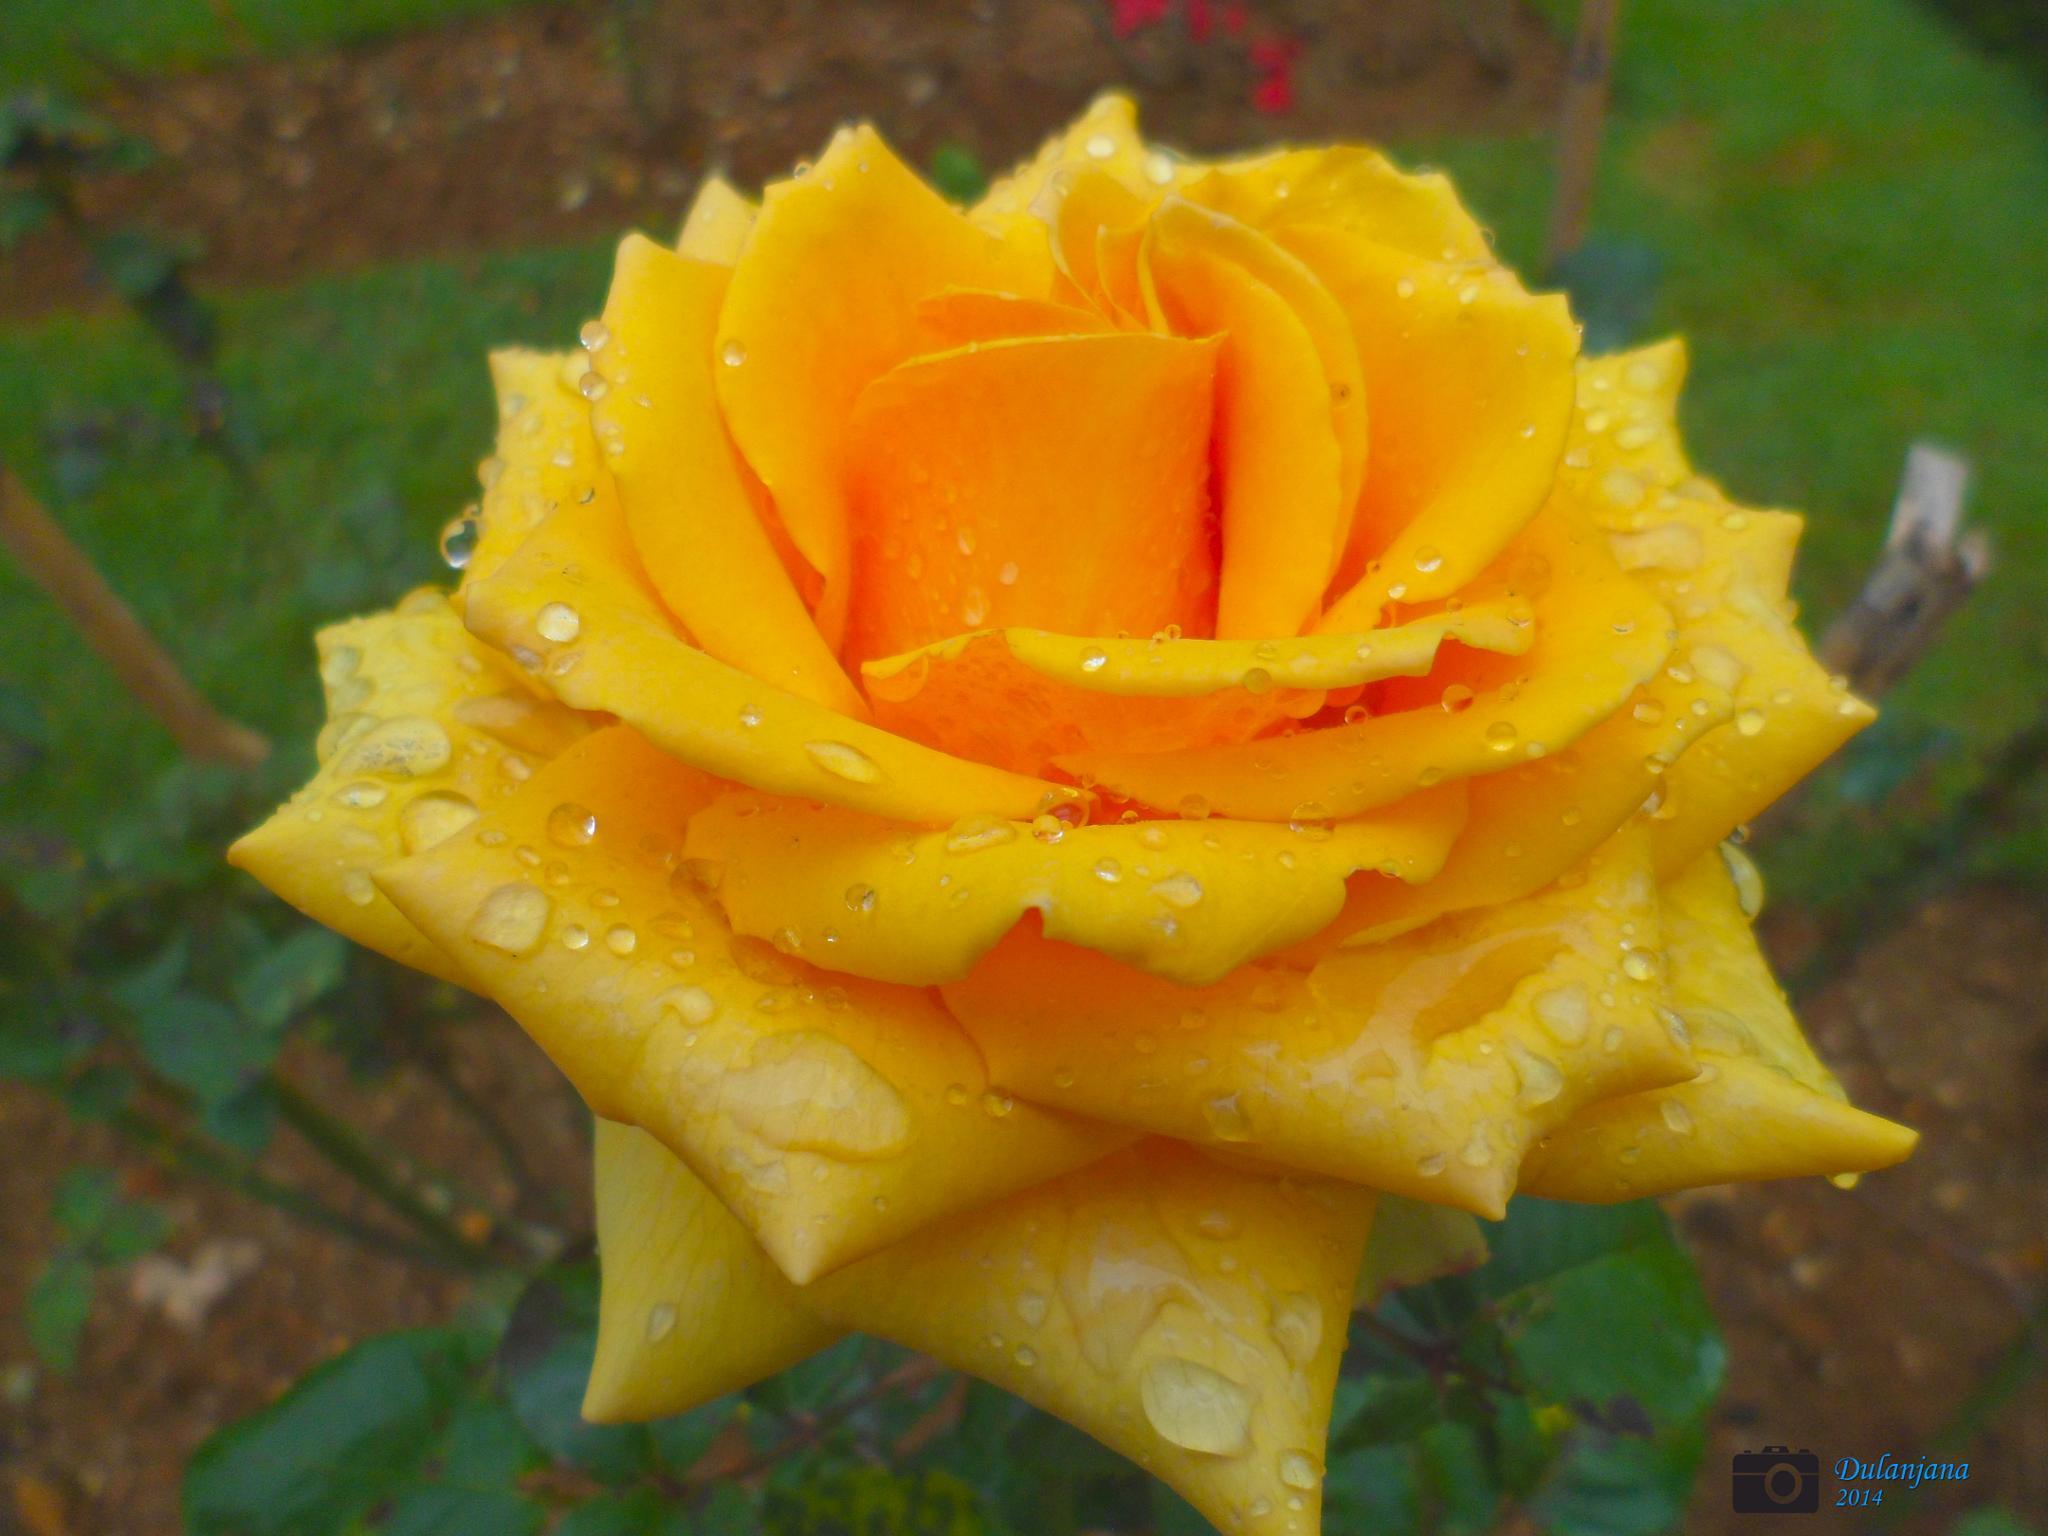 Rose simple definition : WoW  by Dulanjana